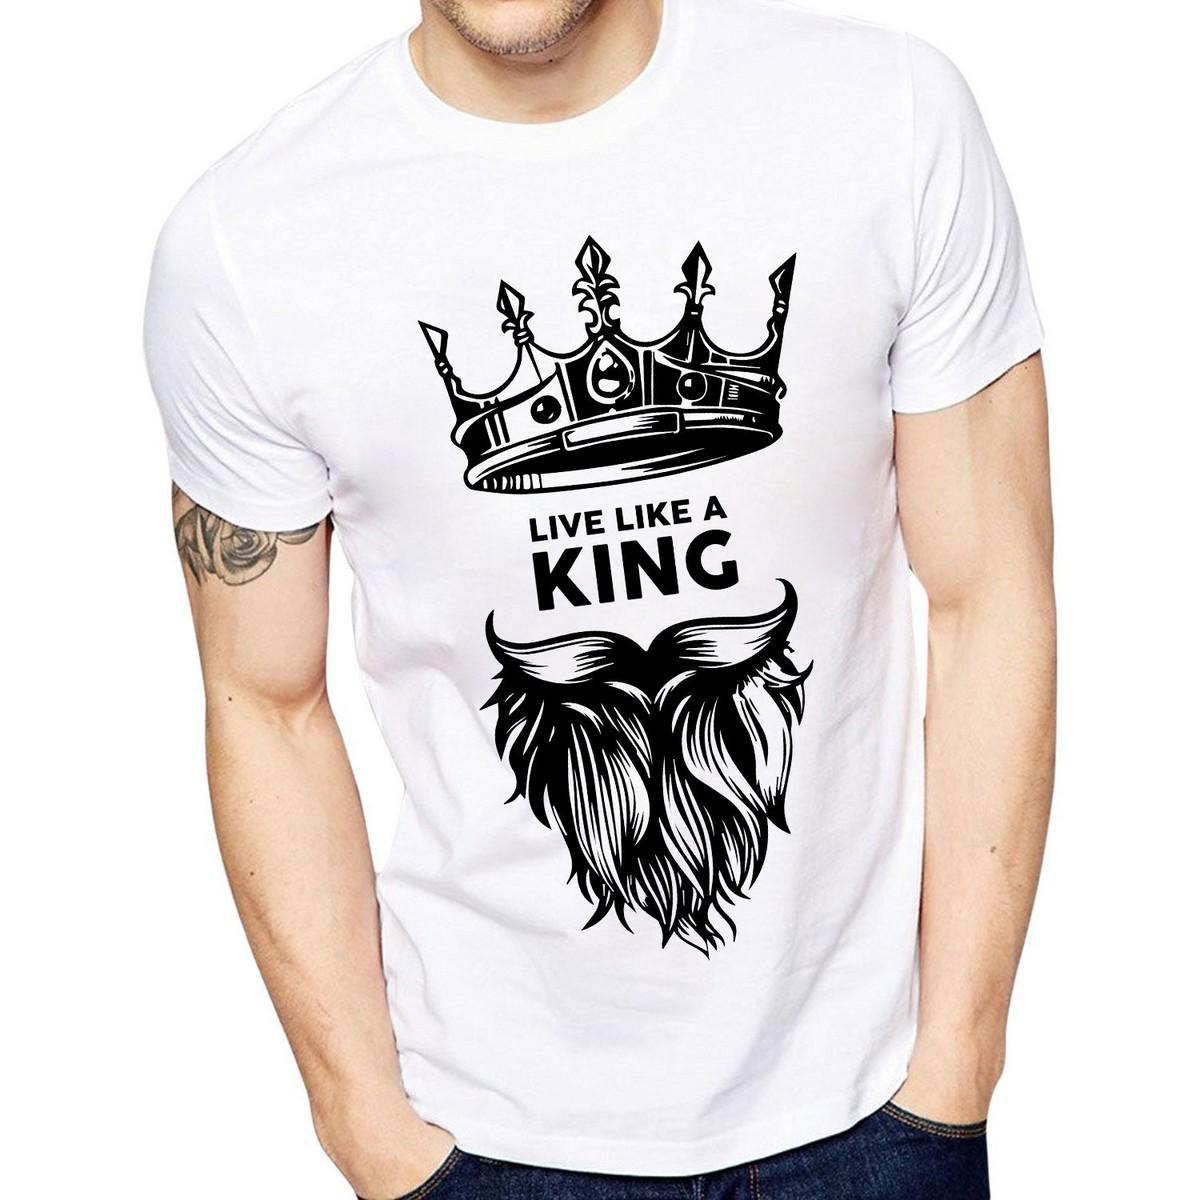 Amazing Smart Fit T Shirt Men O-Neck Half Sleeves Tee Shirt Round Neck Cotton TShirt Casual Tshirt TShirt Summer Wear Spring Wear Tops